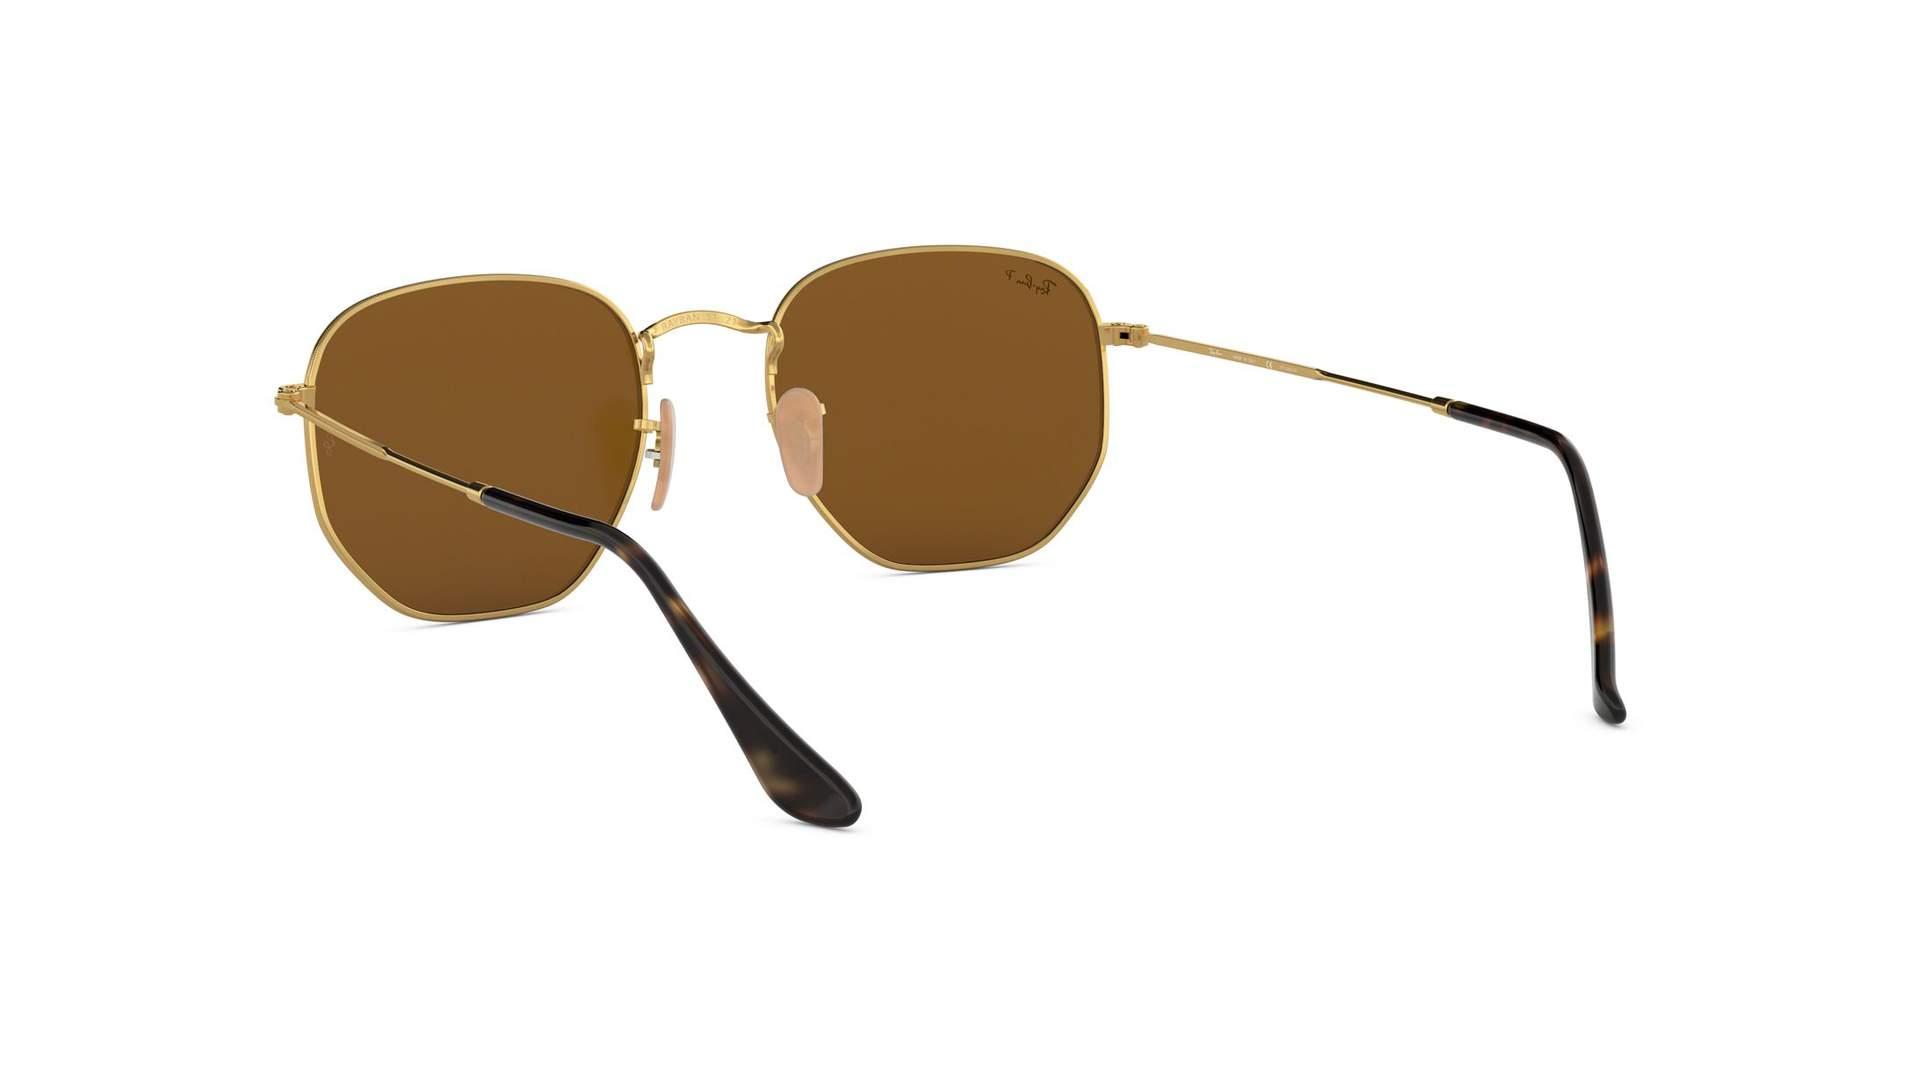 592b91fa771bd Sunglasses Ray-Ban Hexagonal Flat Lenses Gold RB3548N 001 57 51-21 Medium  Polarized